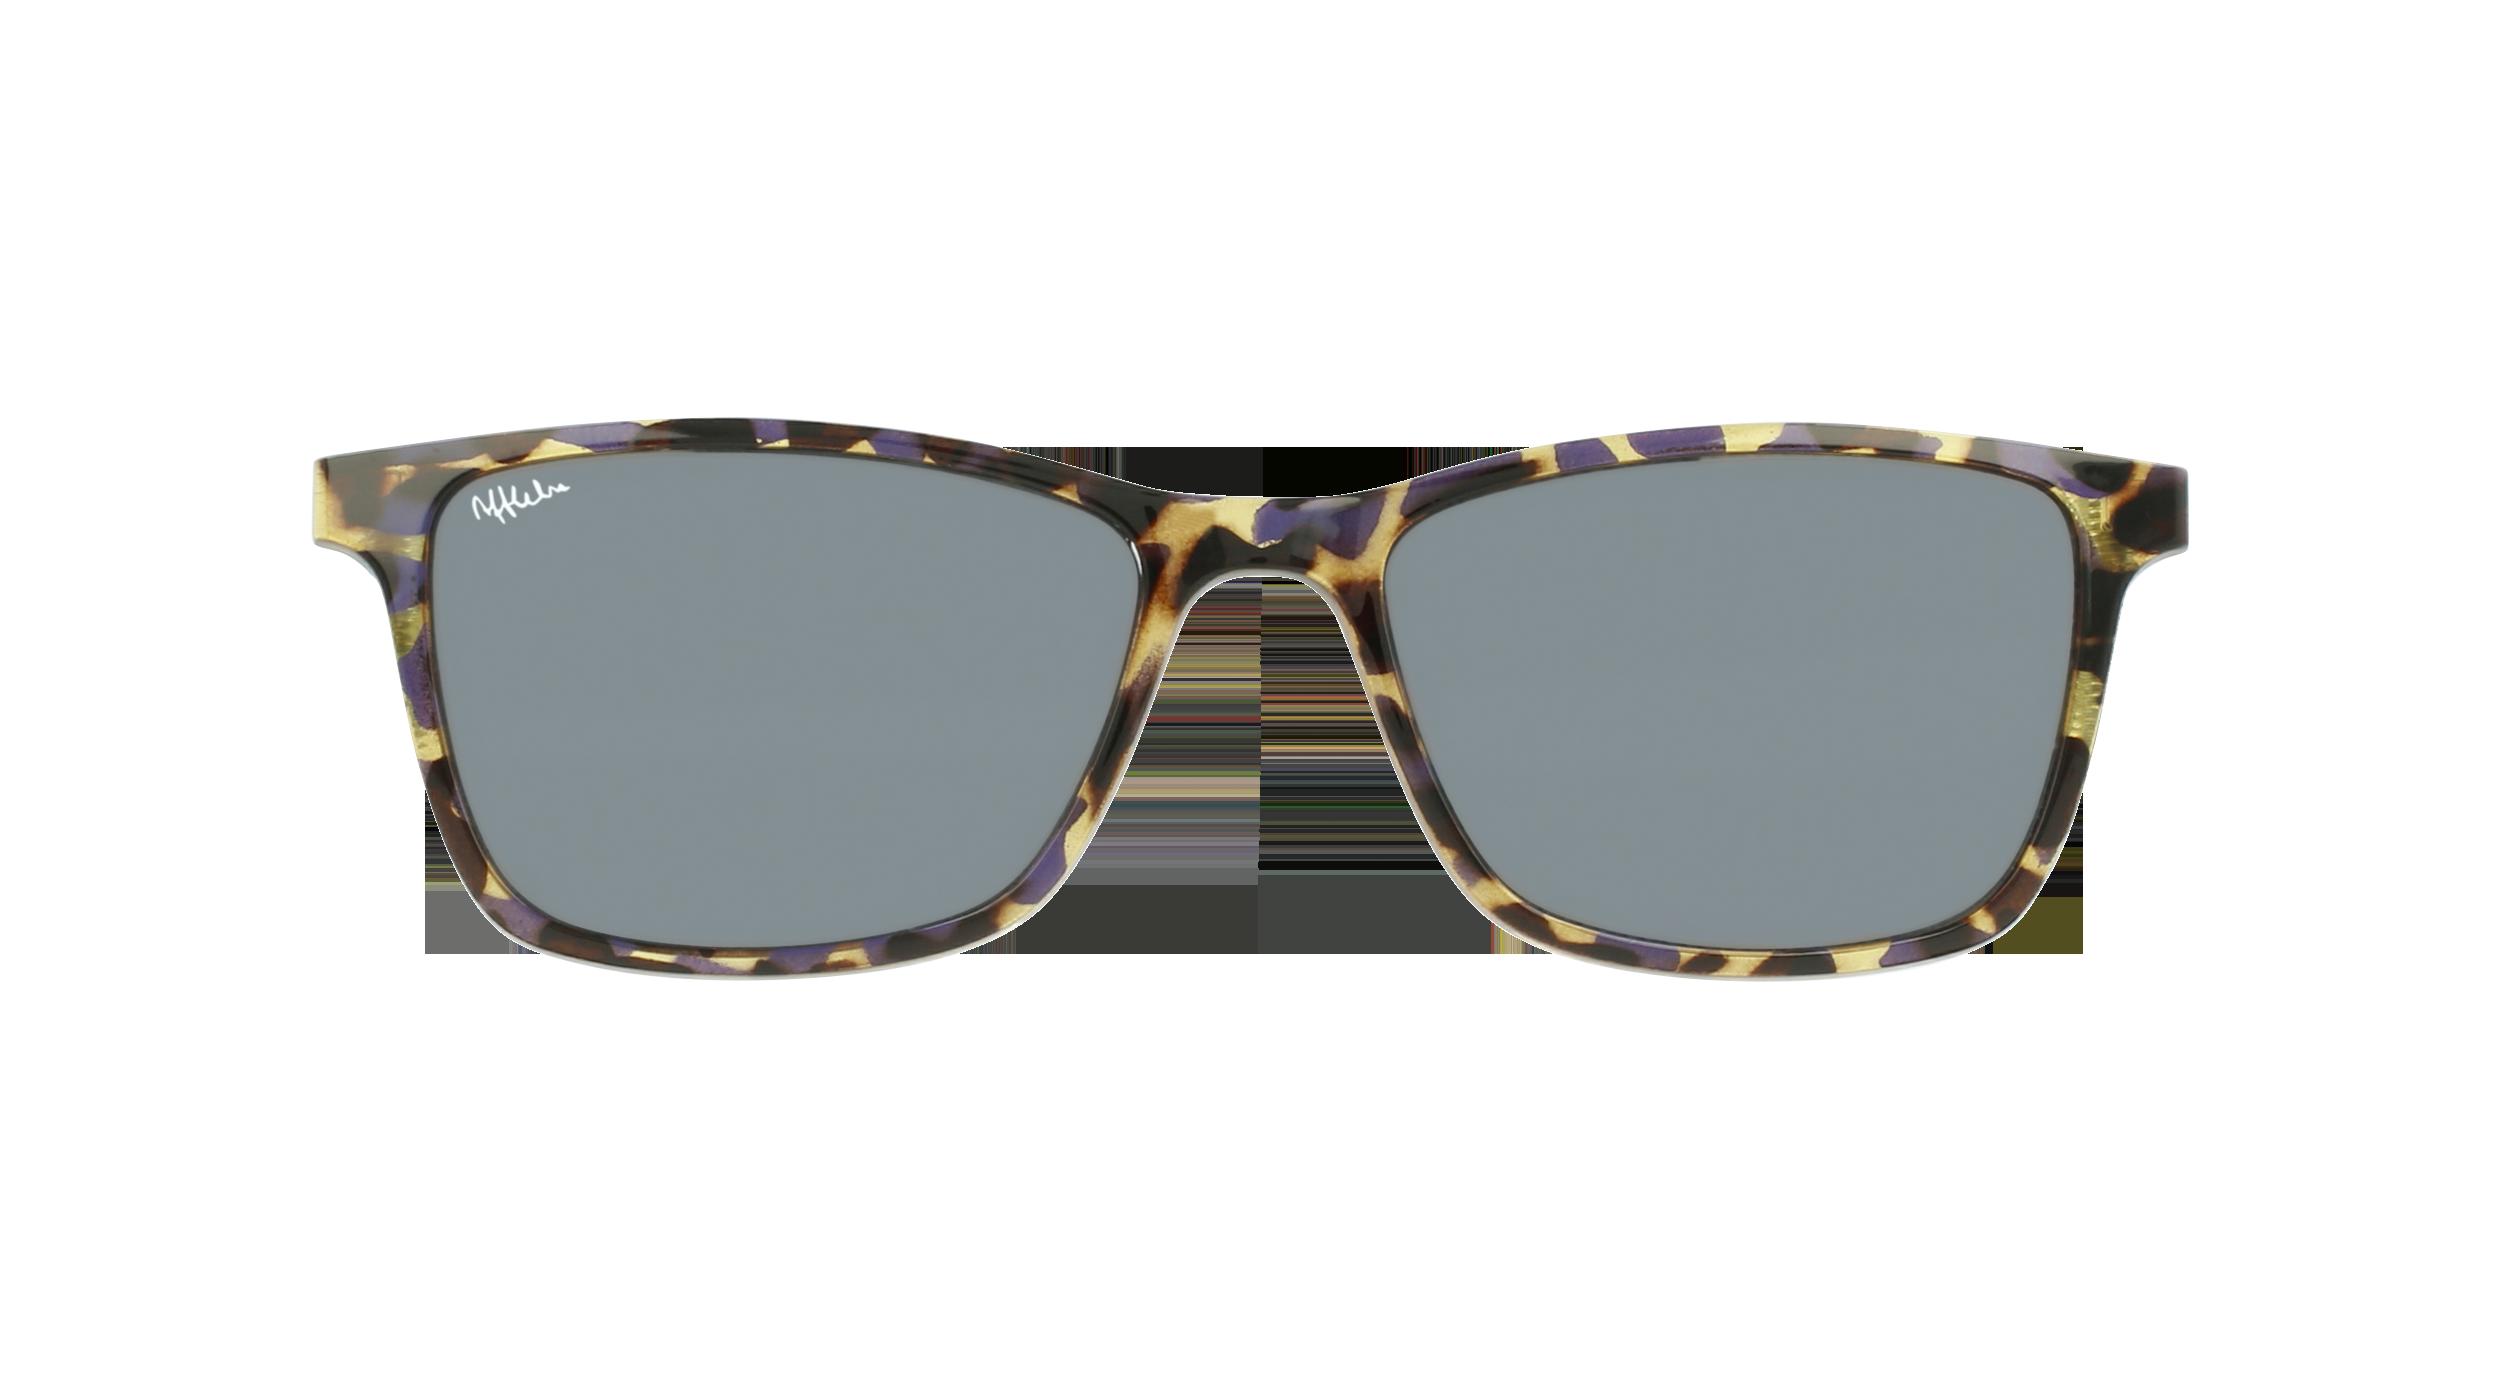 afflelou/france/products/smart_clip/clips_glasses/07630036457719.png